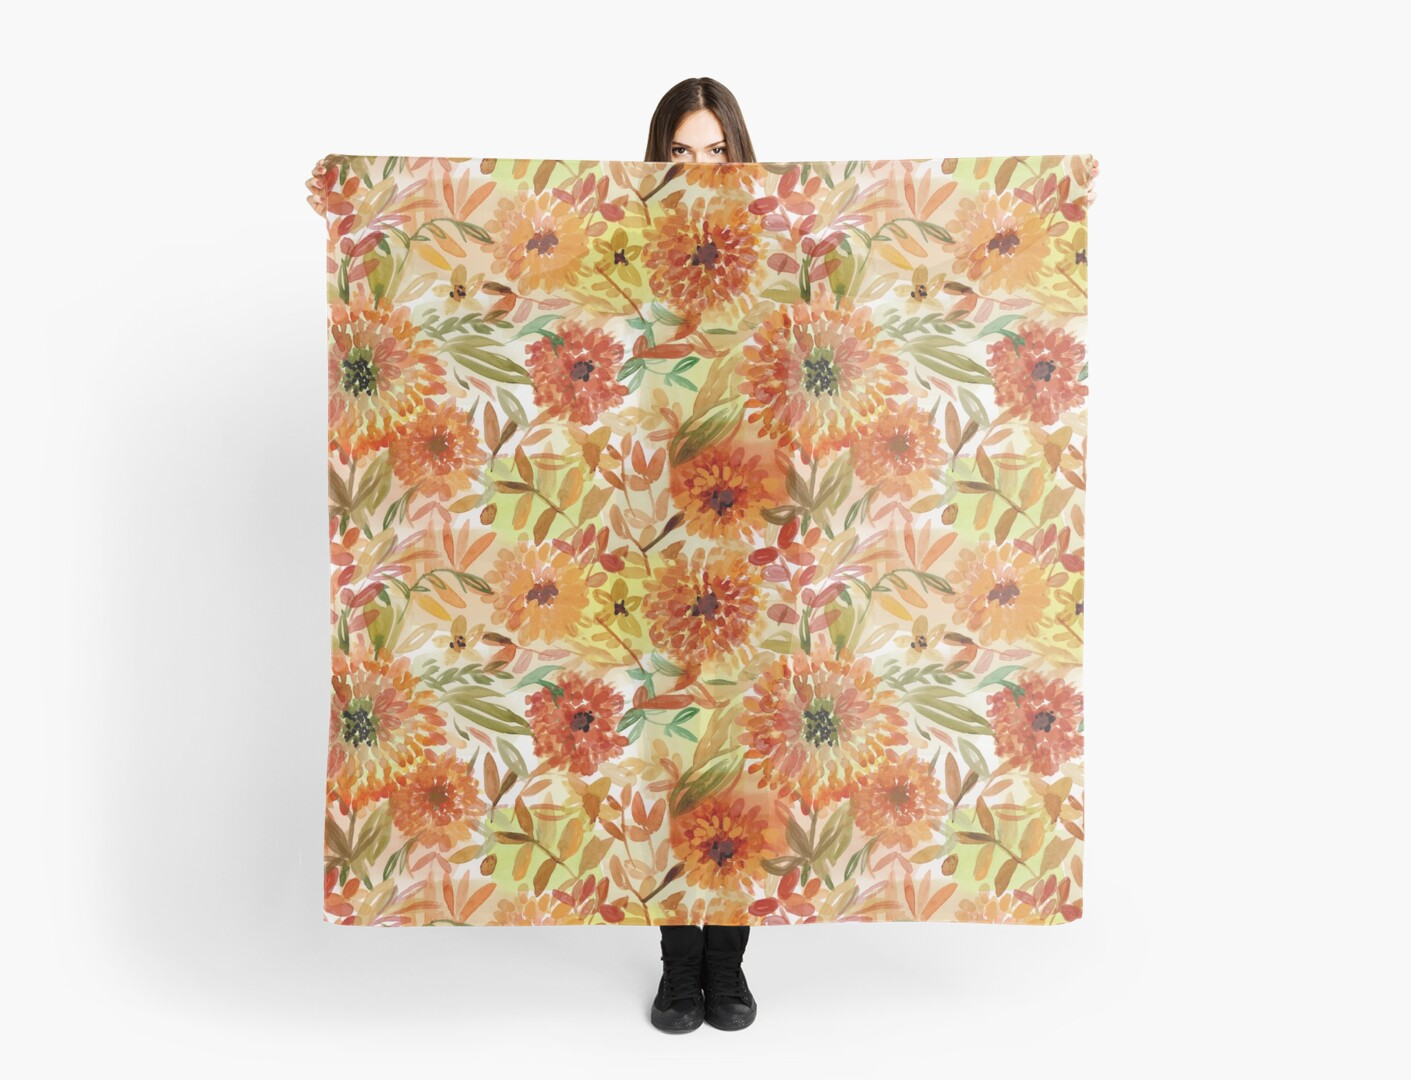 Marigold repeat pattern by denadraws